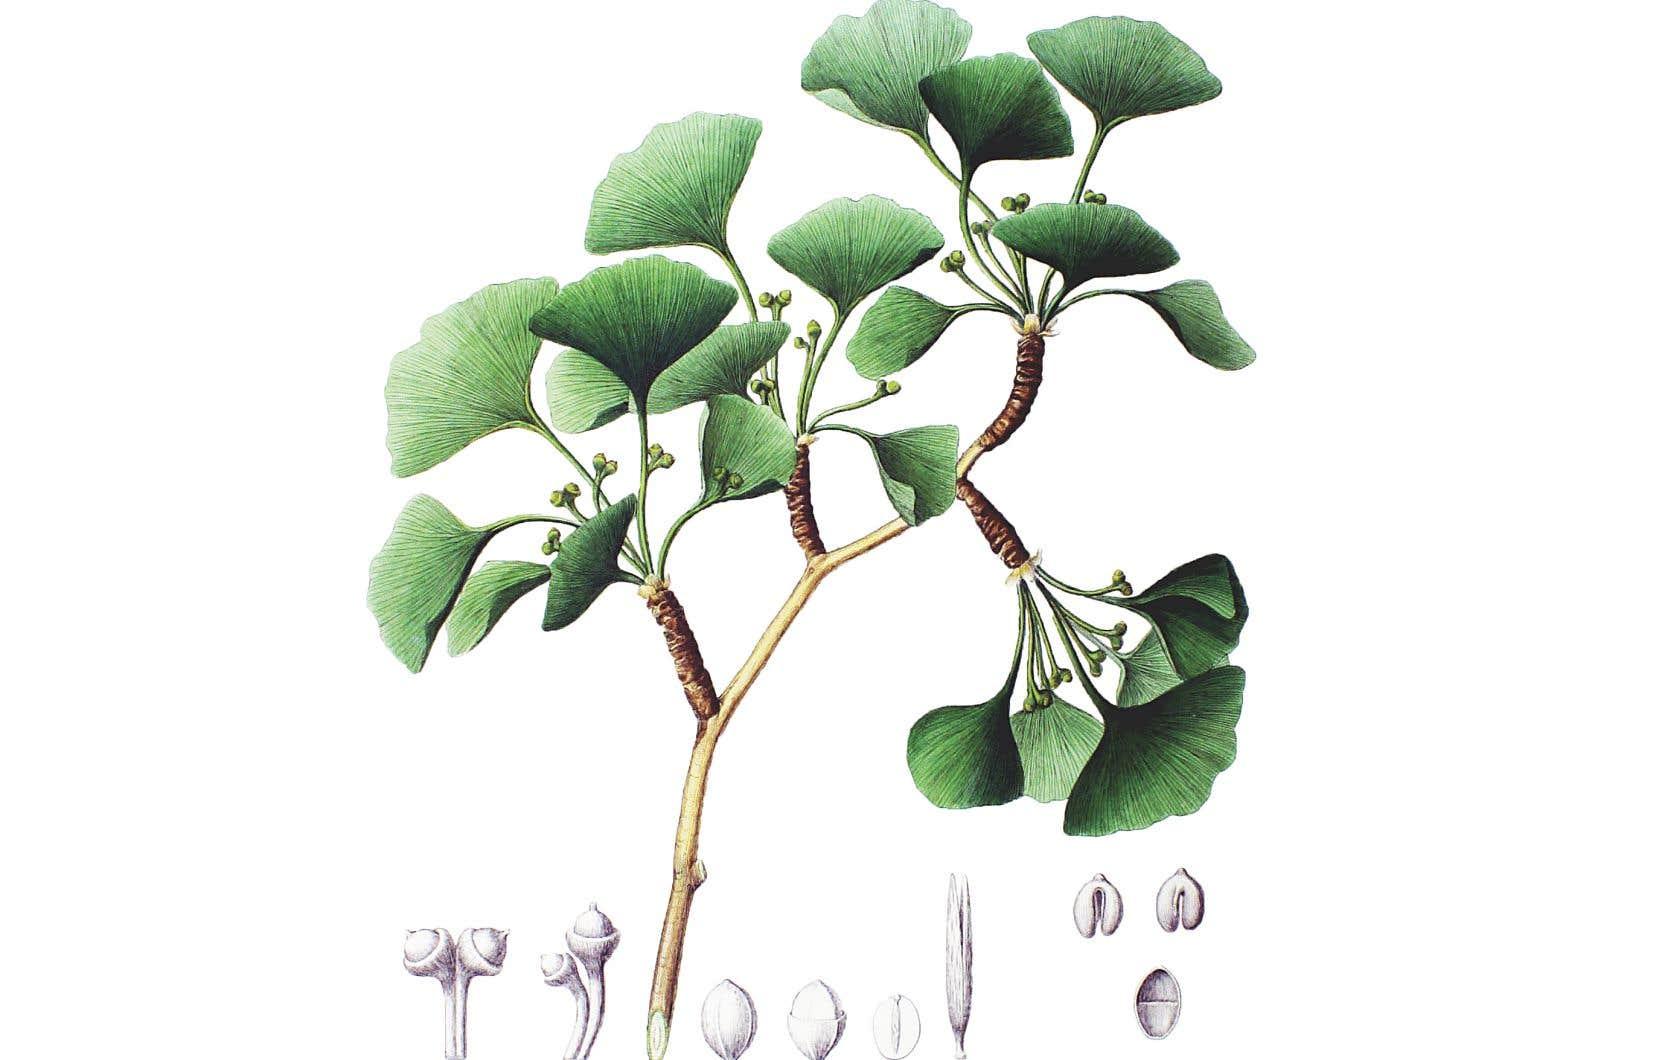 Le ginkgo biloba («Salisburia adiantifolia»). Illustration tirée de «Flora Japonica, Sectio Prima», de Philipp Franz von Siebold et Joseph Gerhard Zuccarini.